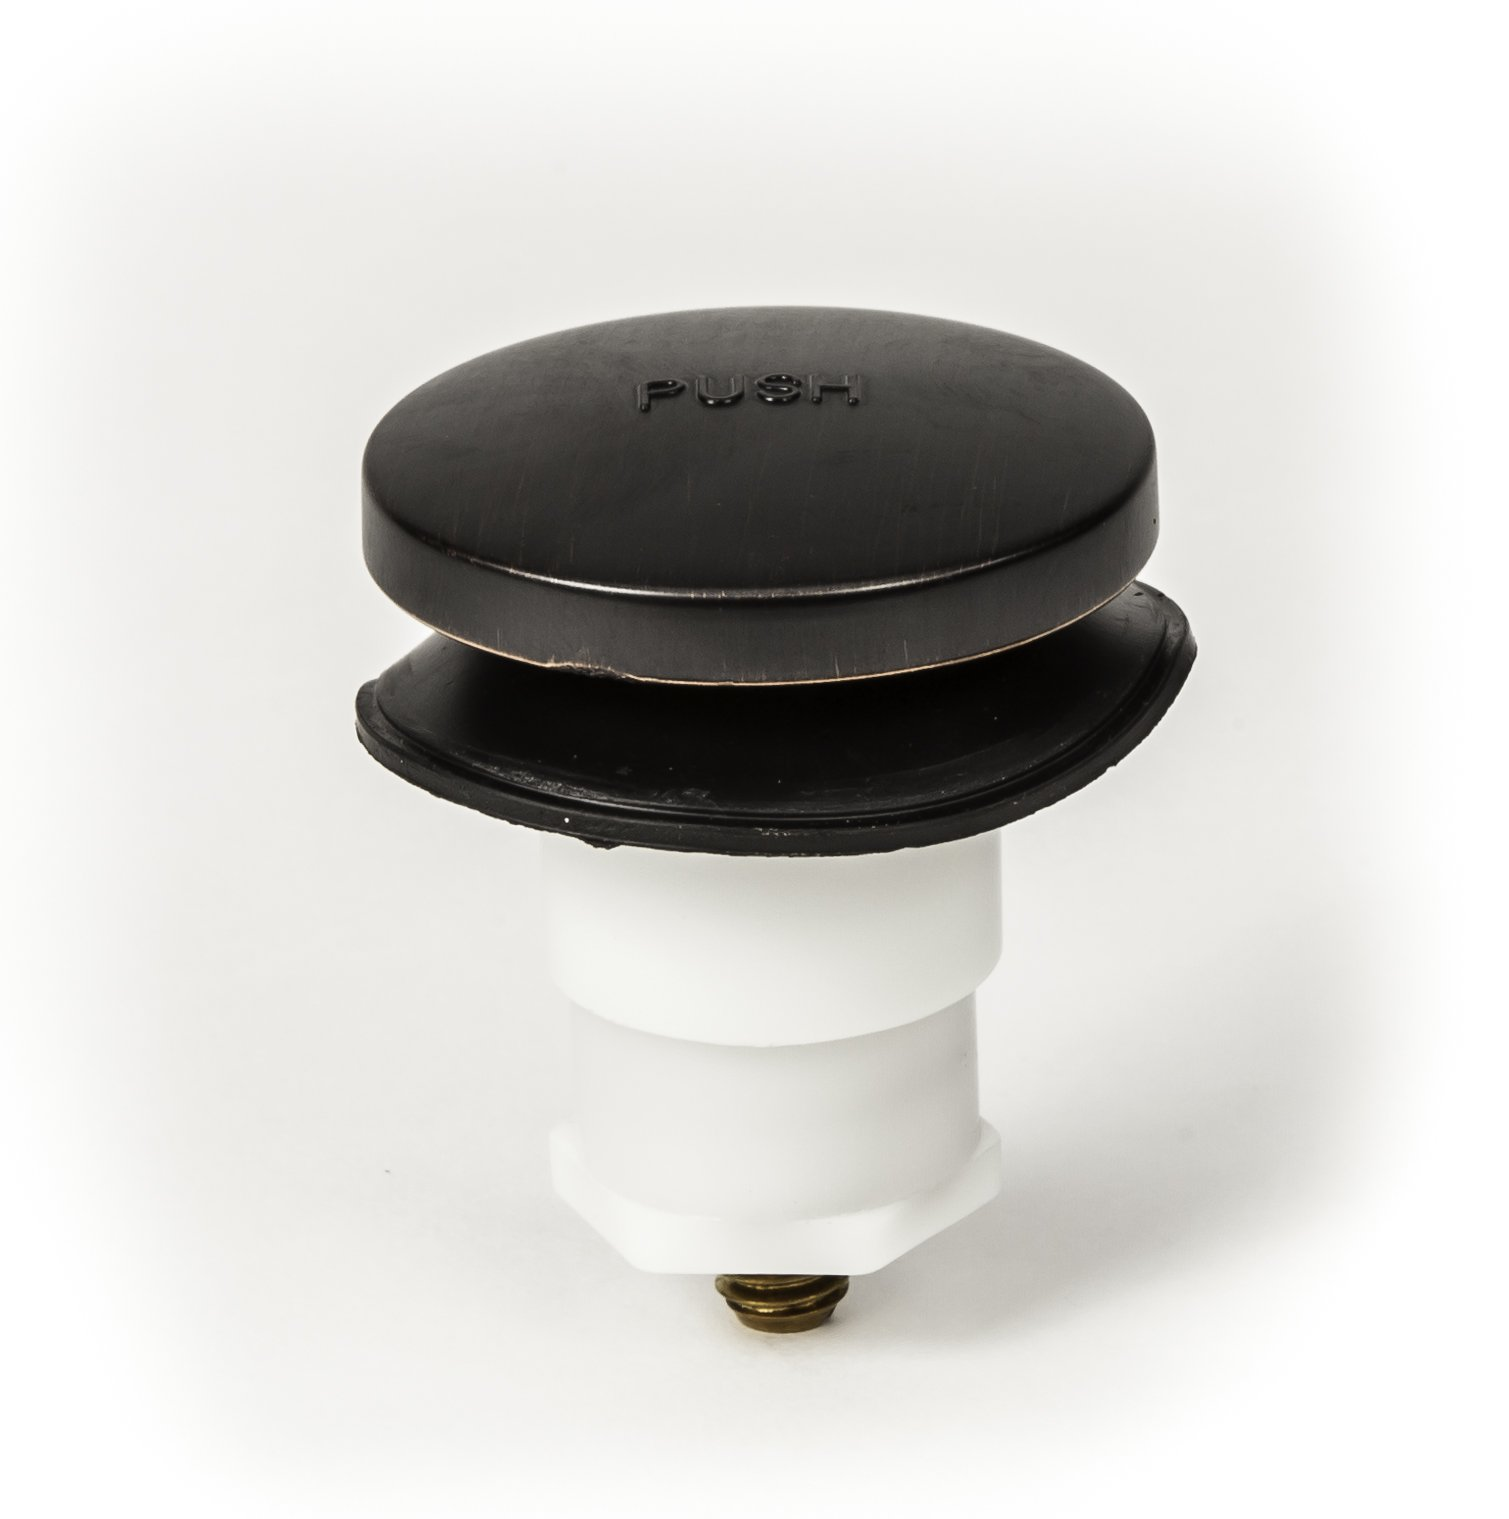 PF WaterWorks Toe TouchBathtub/Bath Tub Drain Trim Kit (Drain + Stopper + Single/One (1) Hole Face Plate) - Coarse 11.5 TPI - FREE Hair Catcher; Oil Rubbed Bronze; PF0970-ORB-TT-C by PF WaterWorks (Image #2)